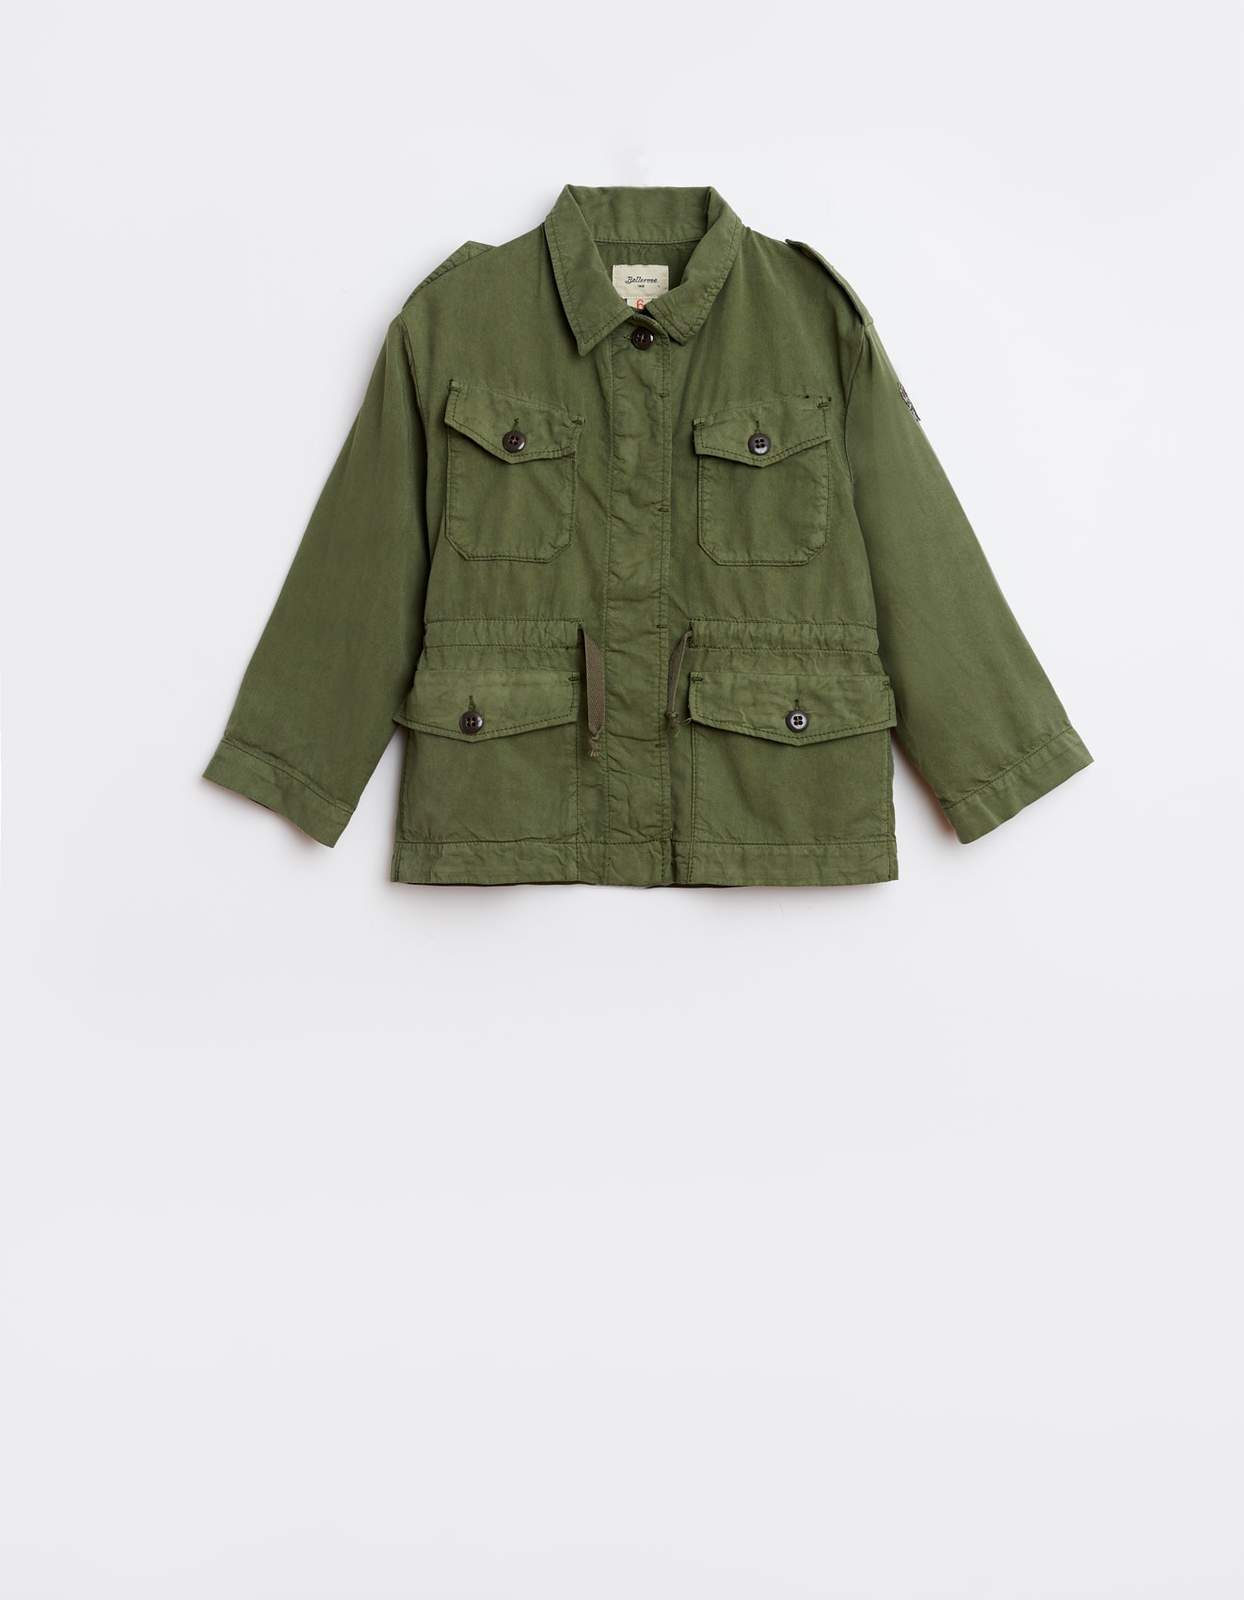 BLR-patent-r0682-army-jacket_1_1600x1600.jpg